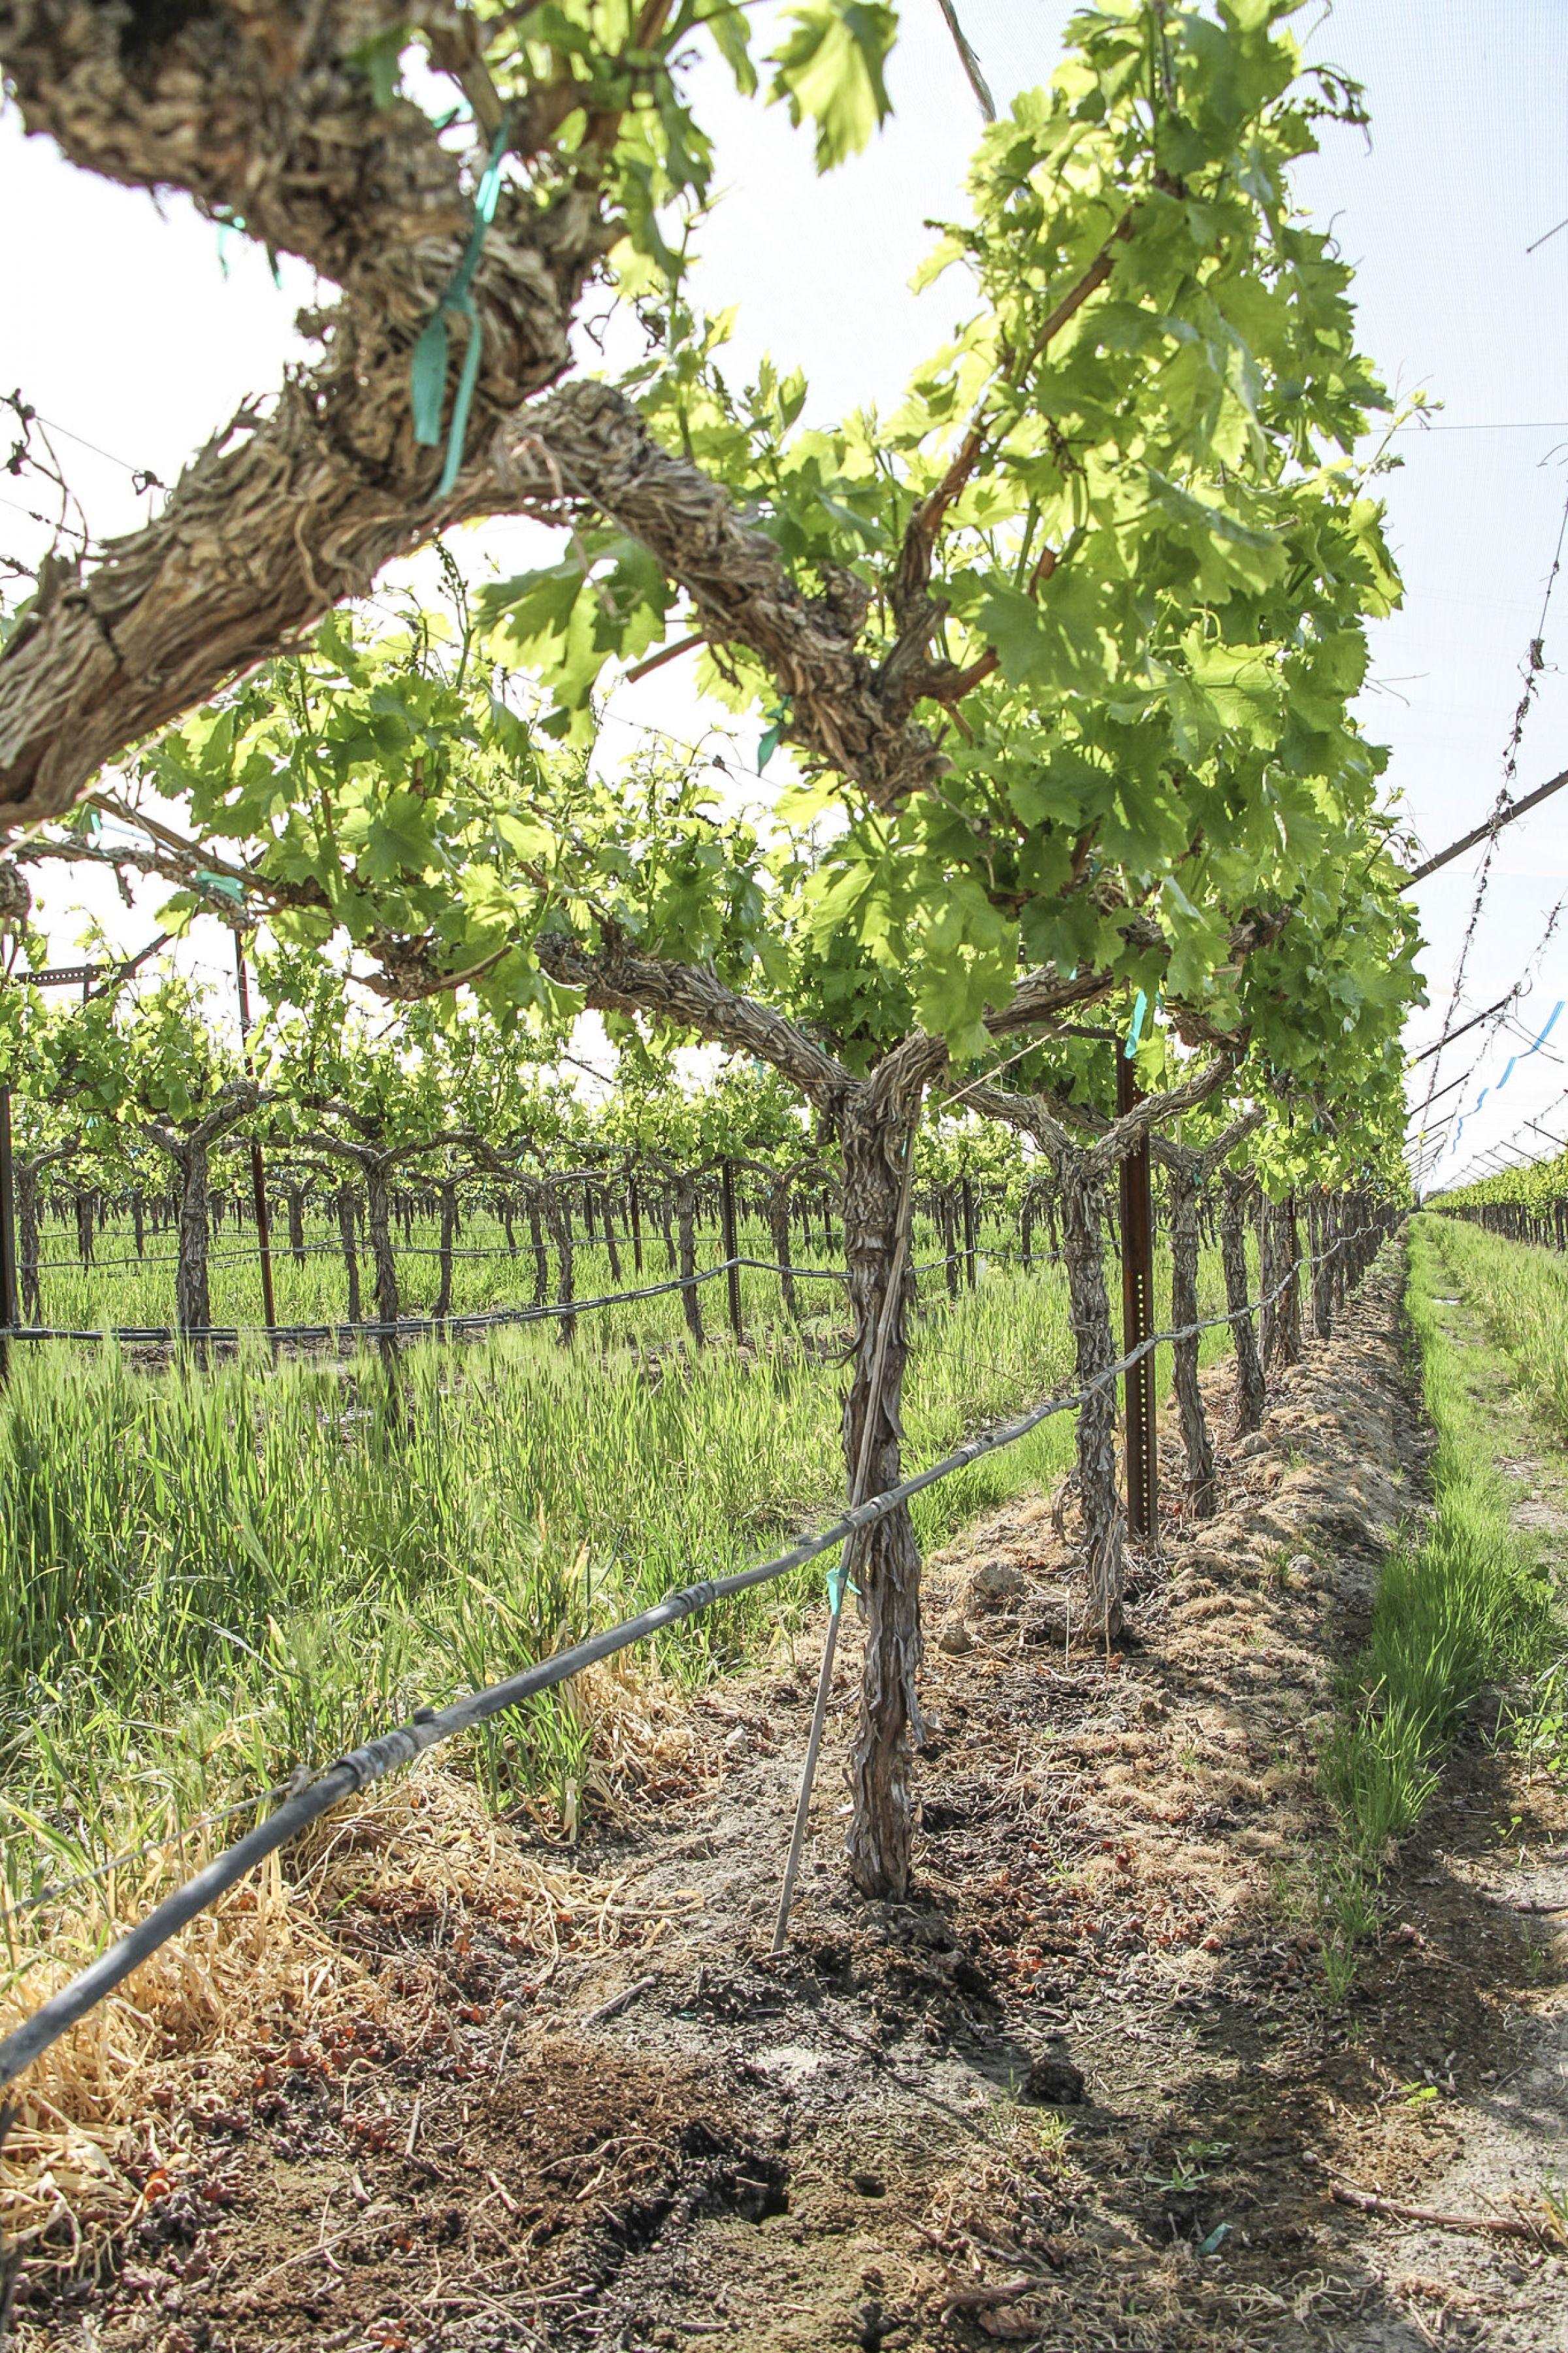 land-riverside-county-california-1669-acres-listing-number-15465-0-2021-06-16-001015.jpg